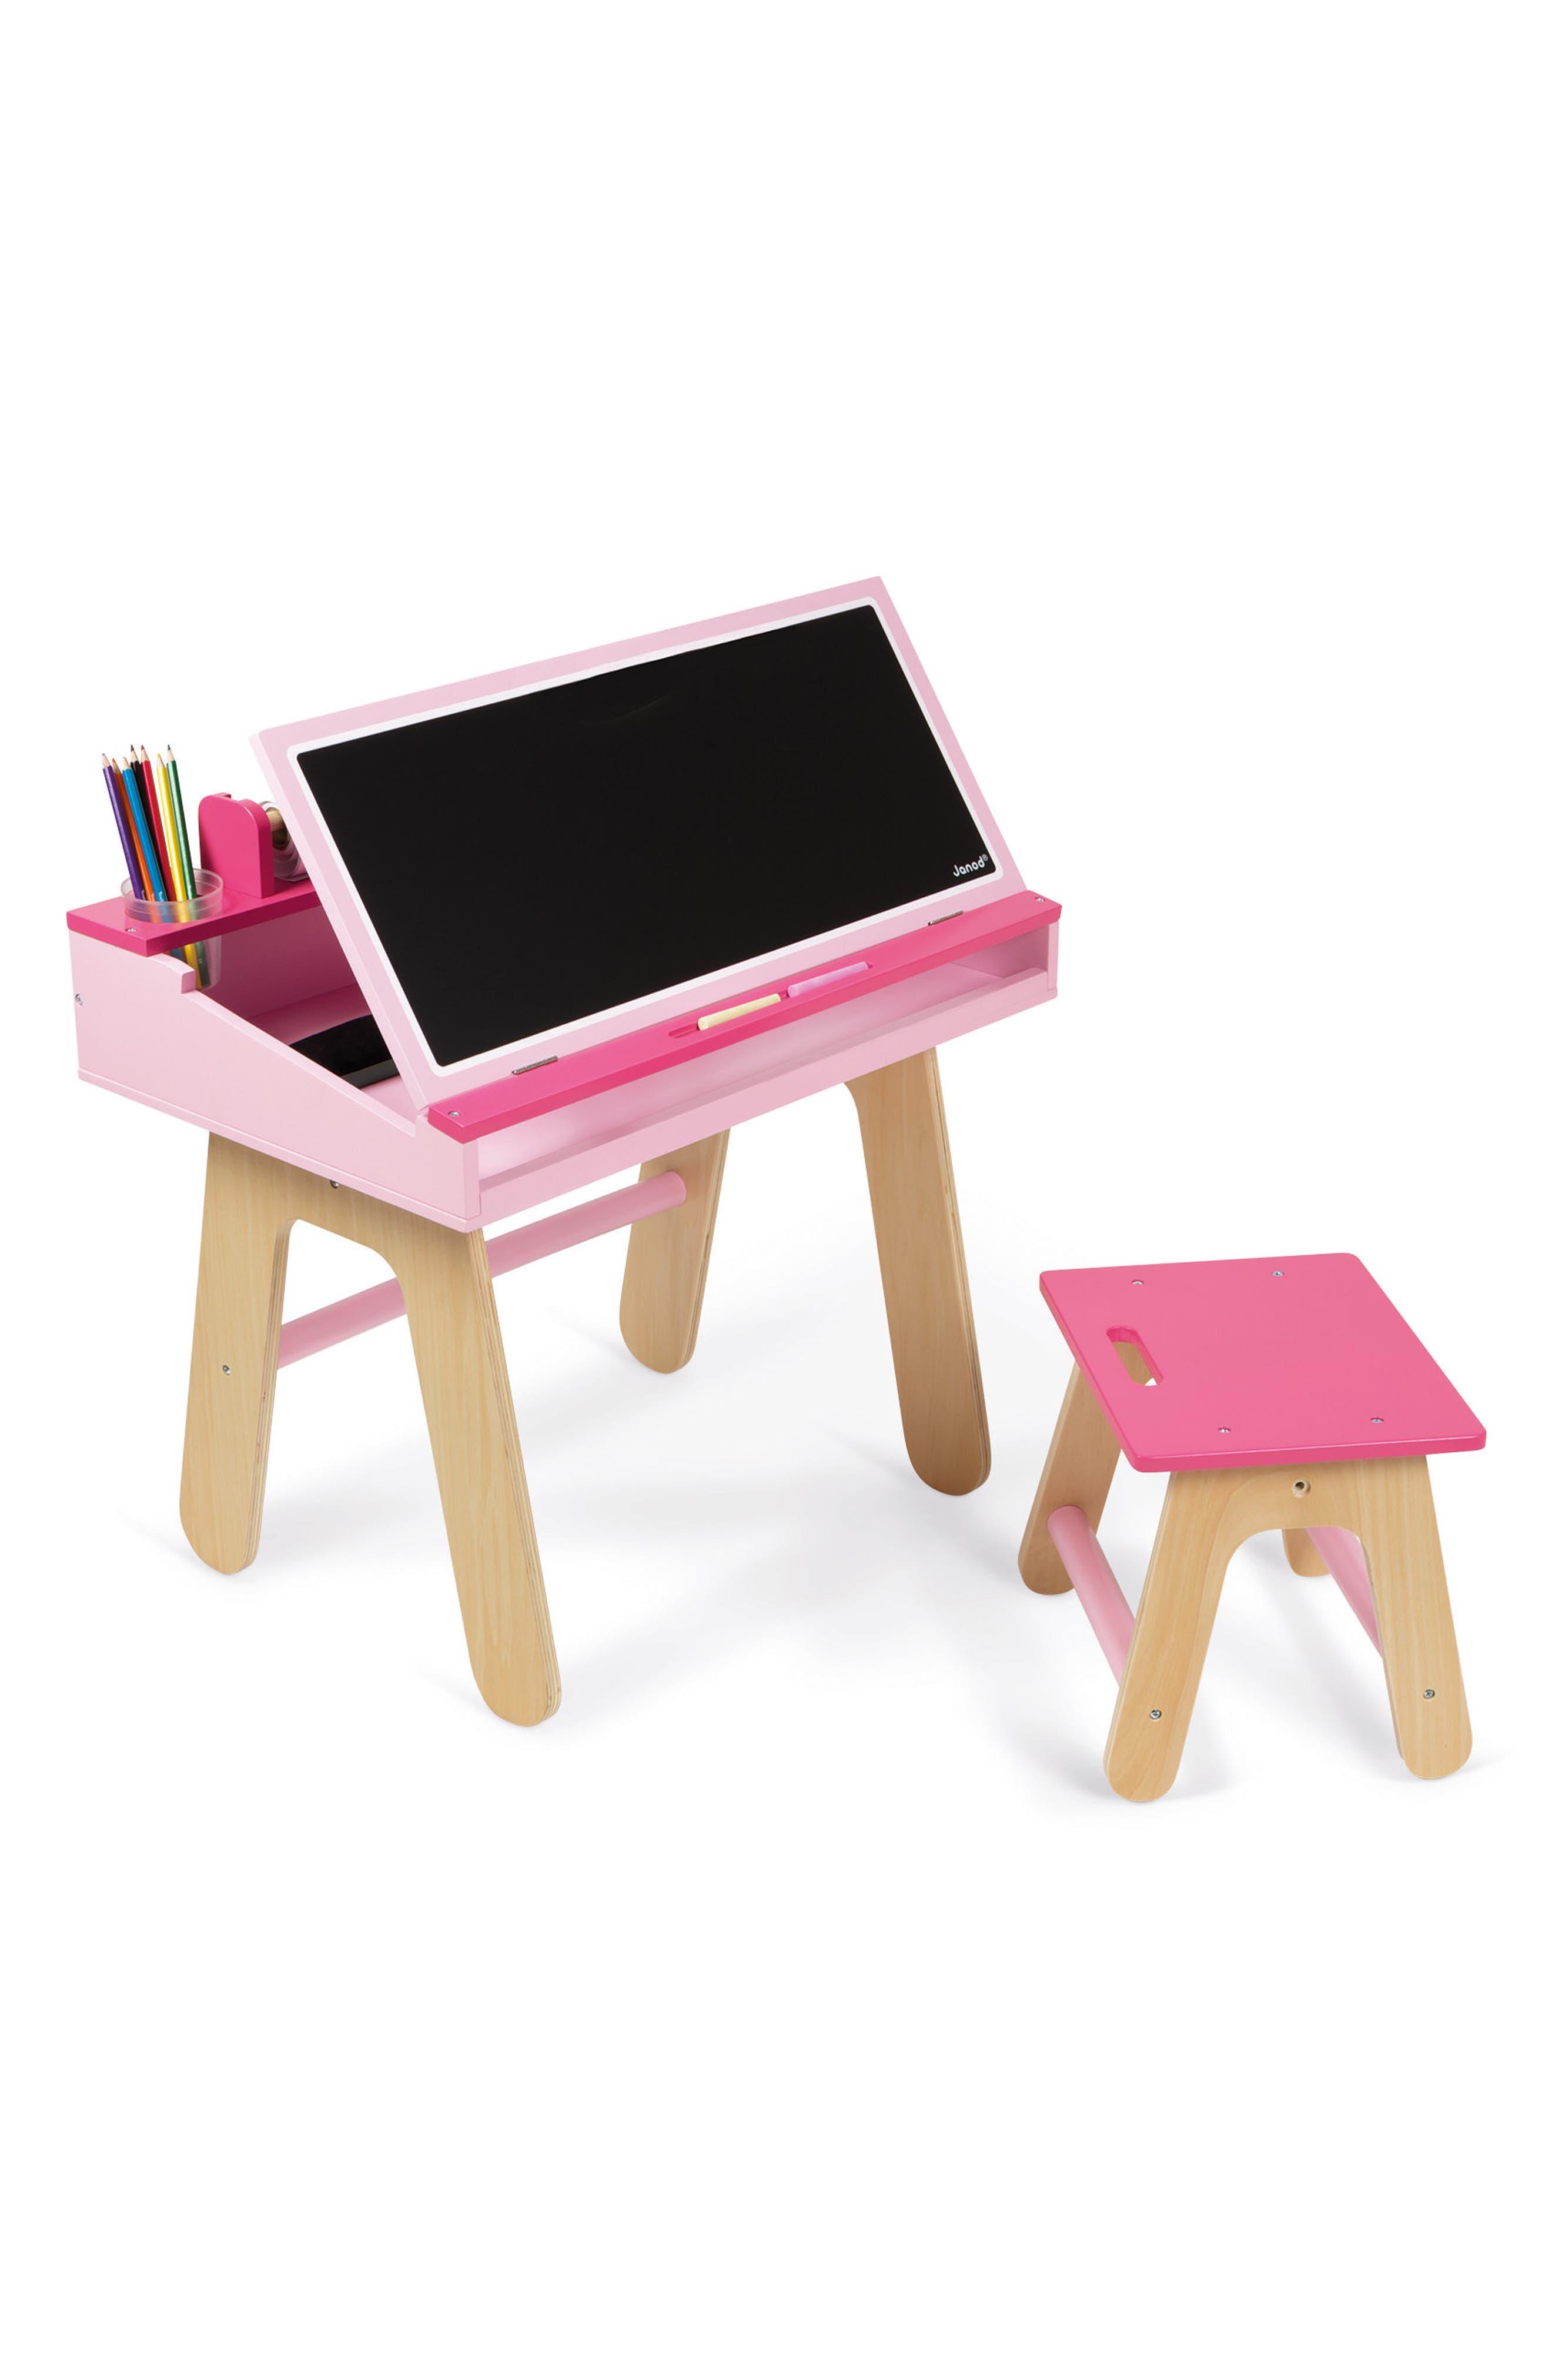 Alternate Image 1 Selected - Janod Easel Top Desk & Chair Set